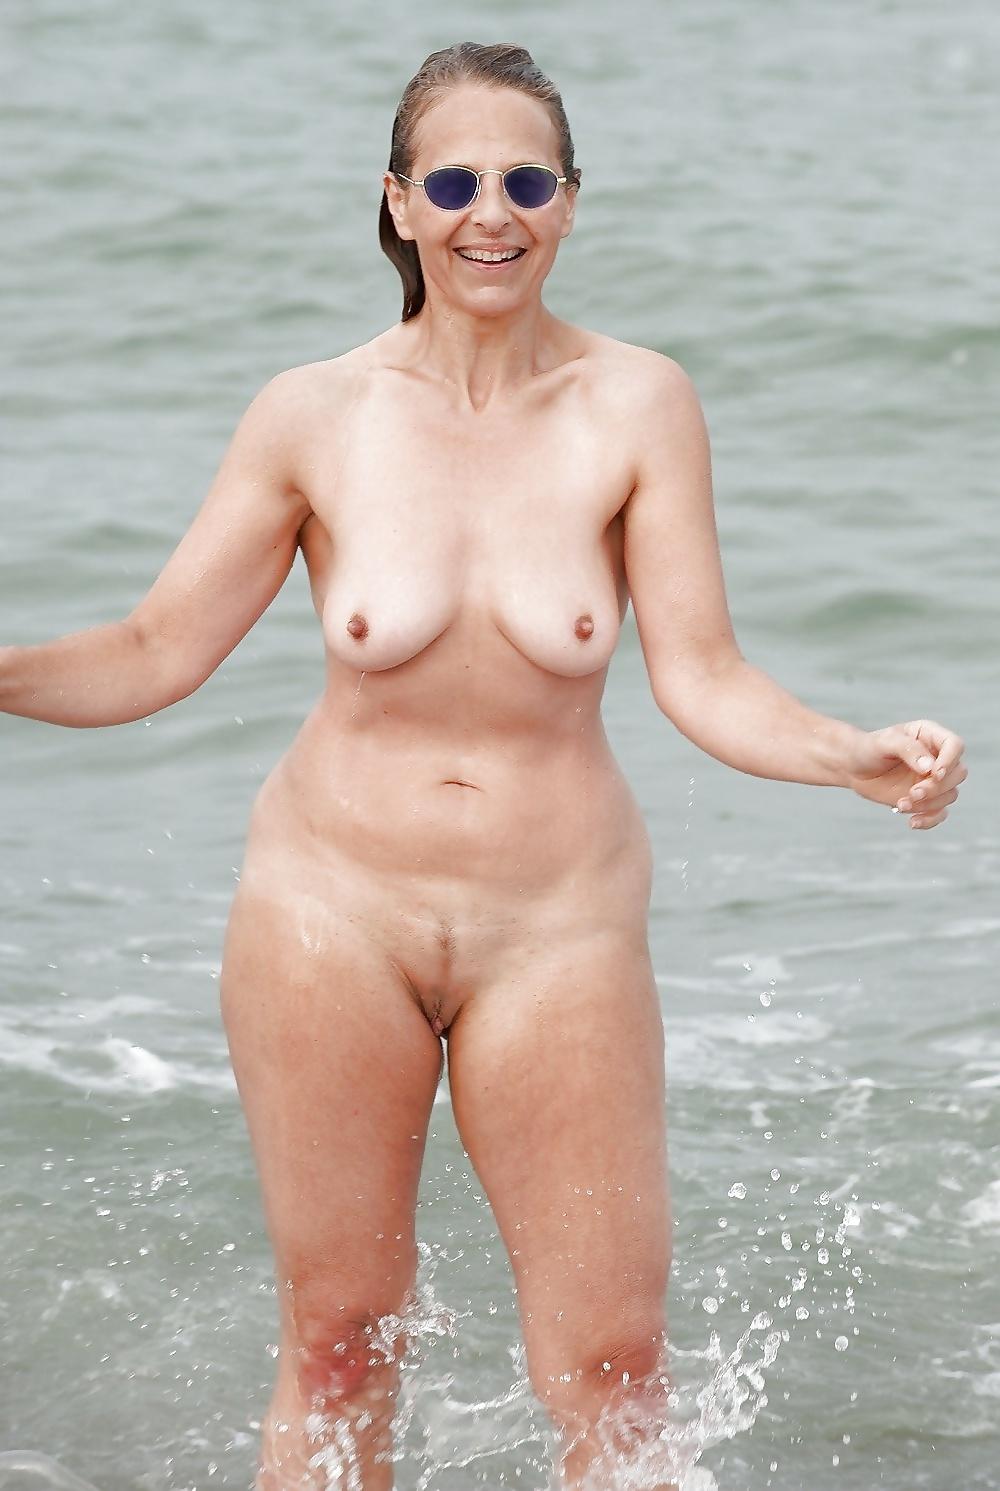 Amusing message boobs amatuer nude beach talk